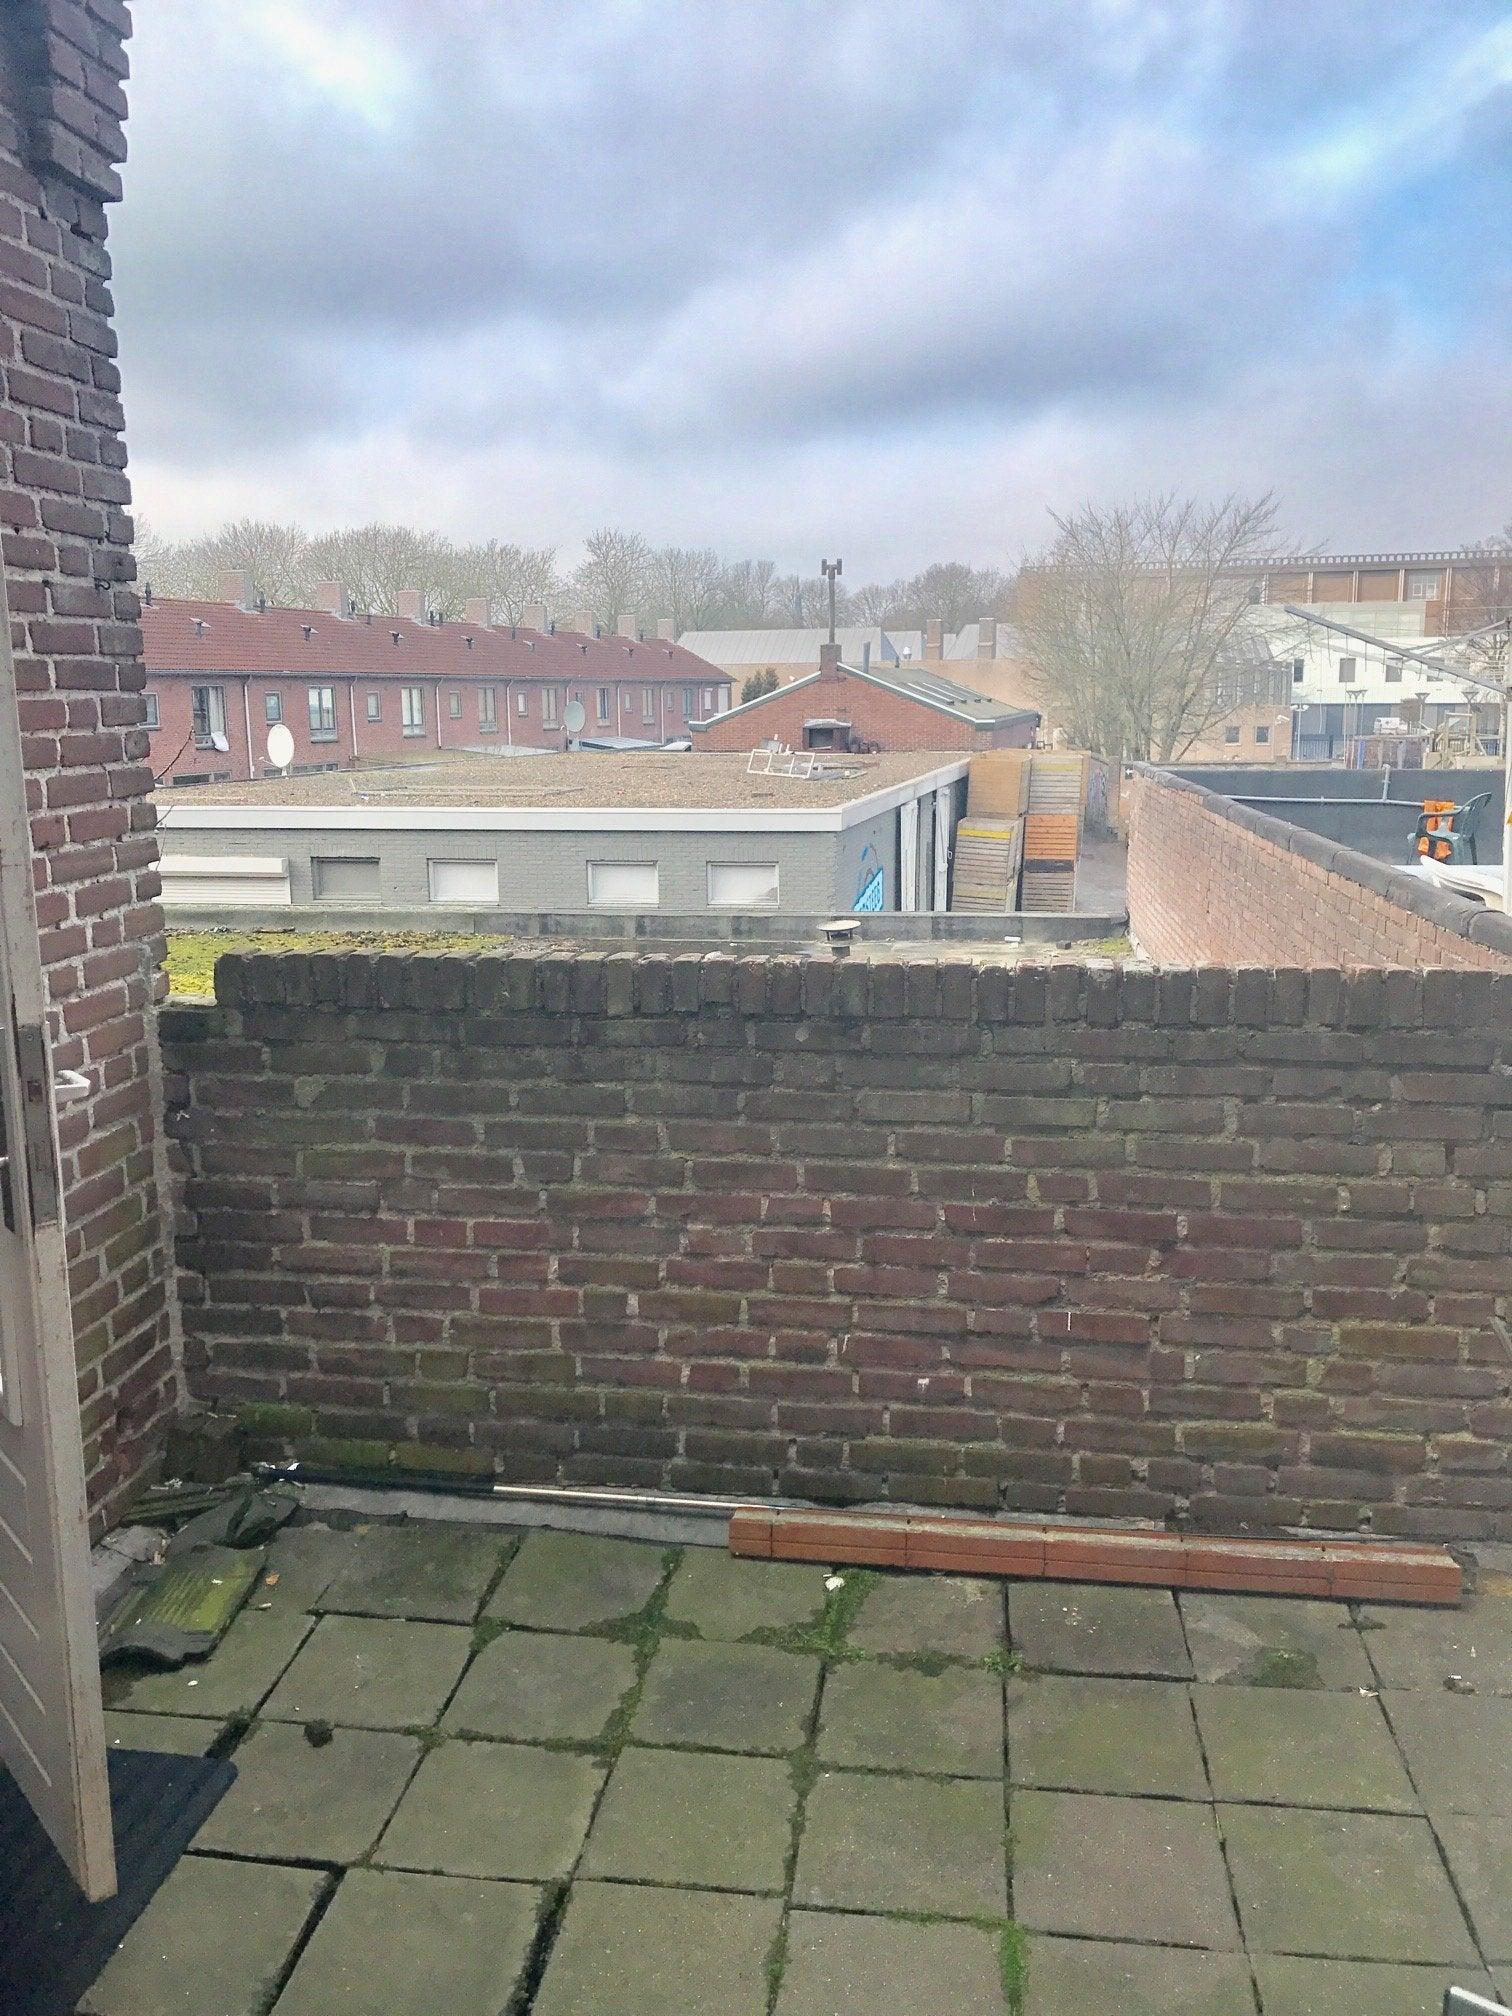 https://public.parariusoffice.nl/298/photos/huge/3616229.1487245702-517.jpg